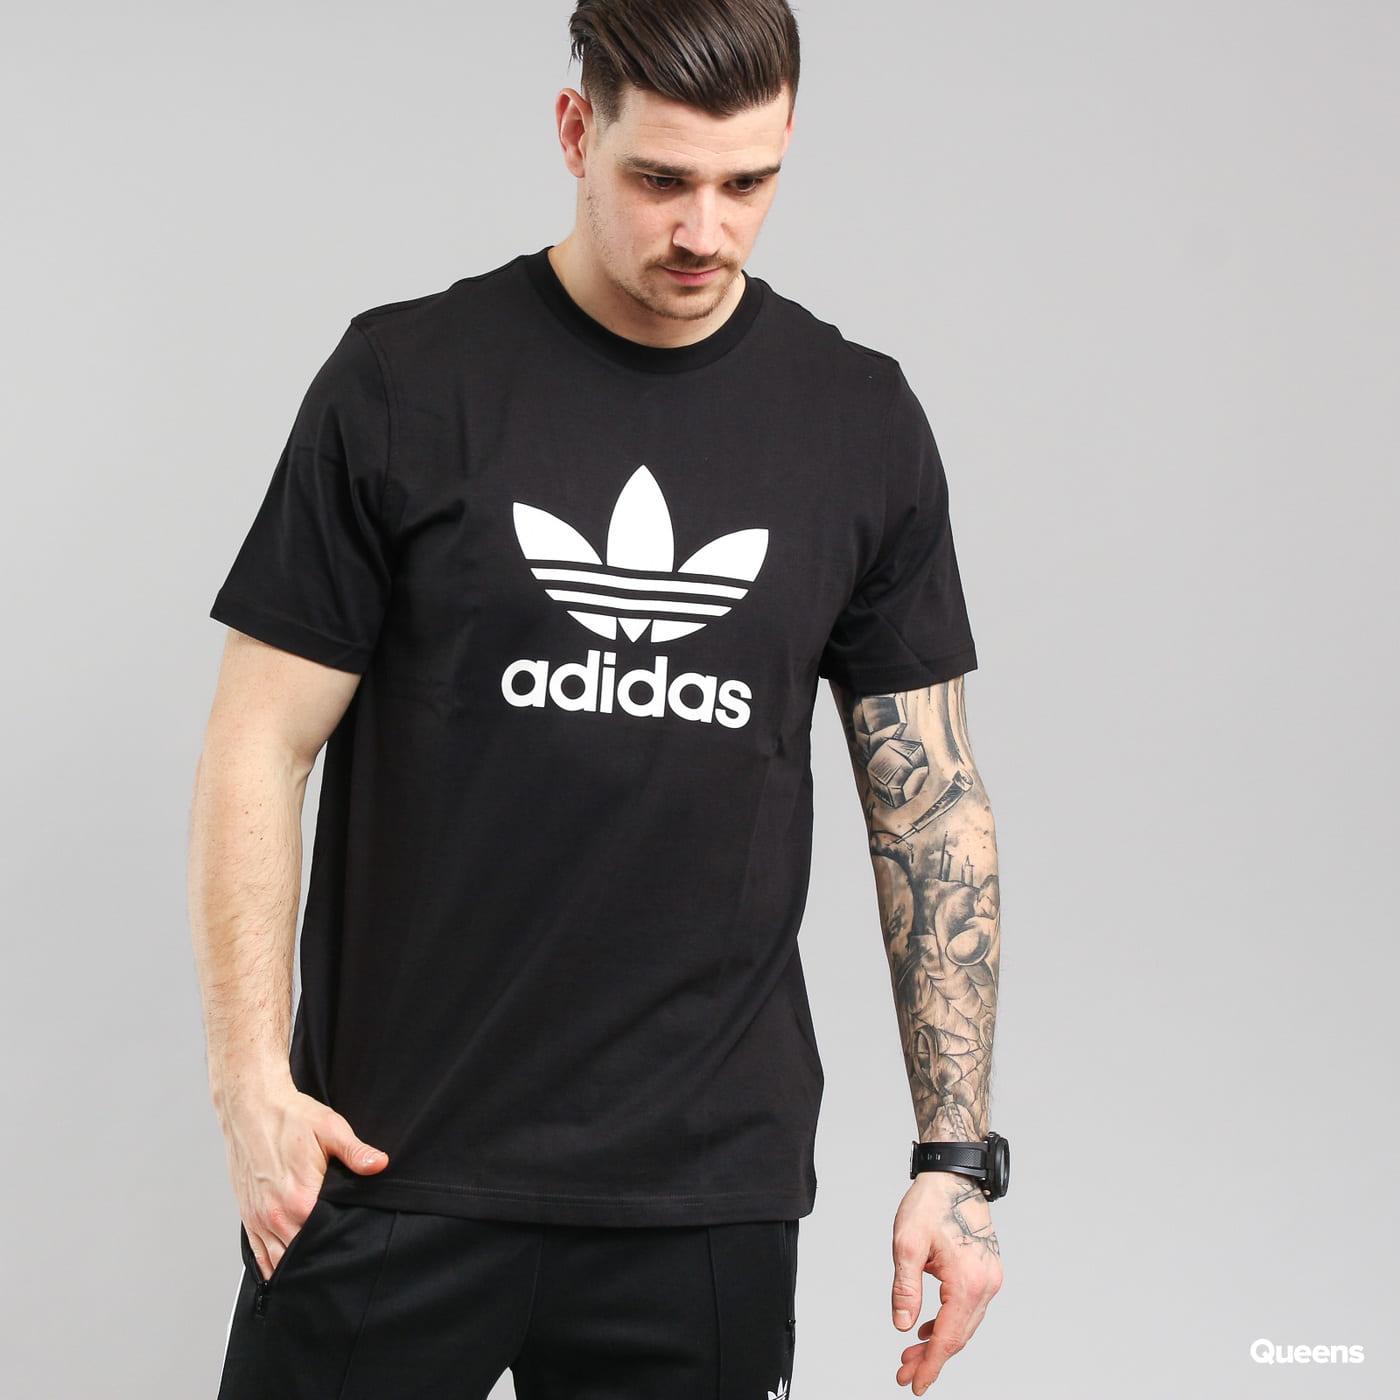 adidas Originals Trefoil T-Shirt schwarz